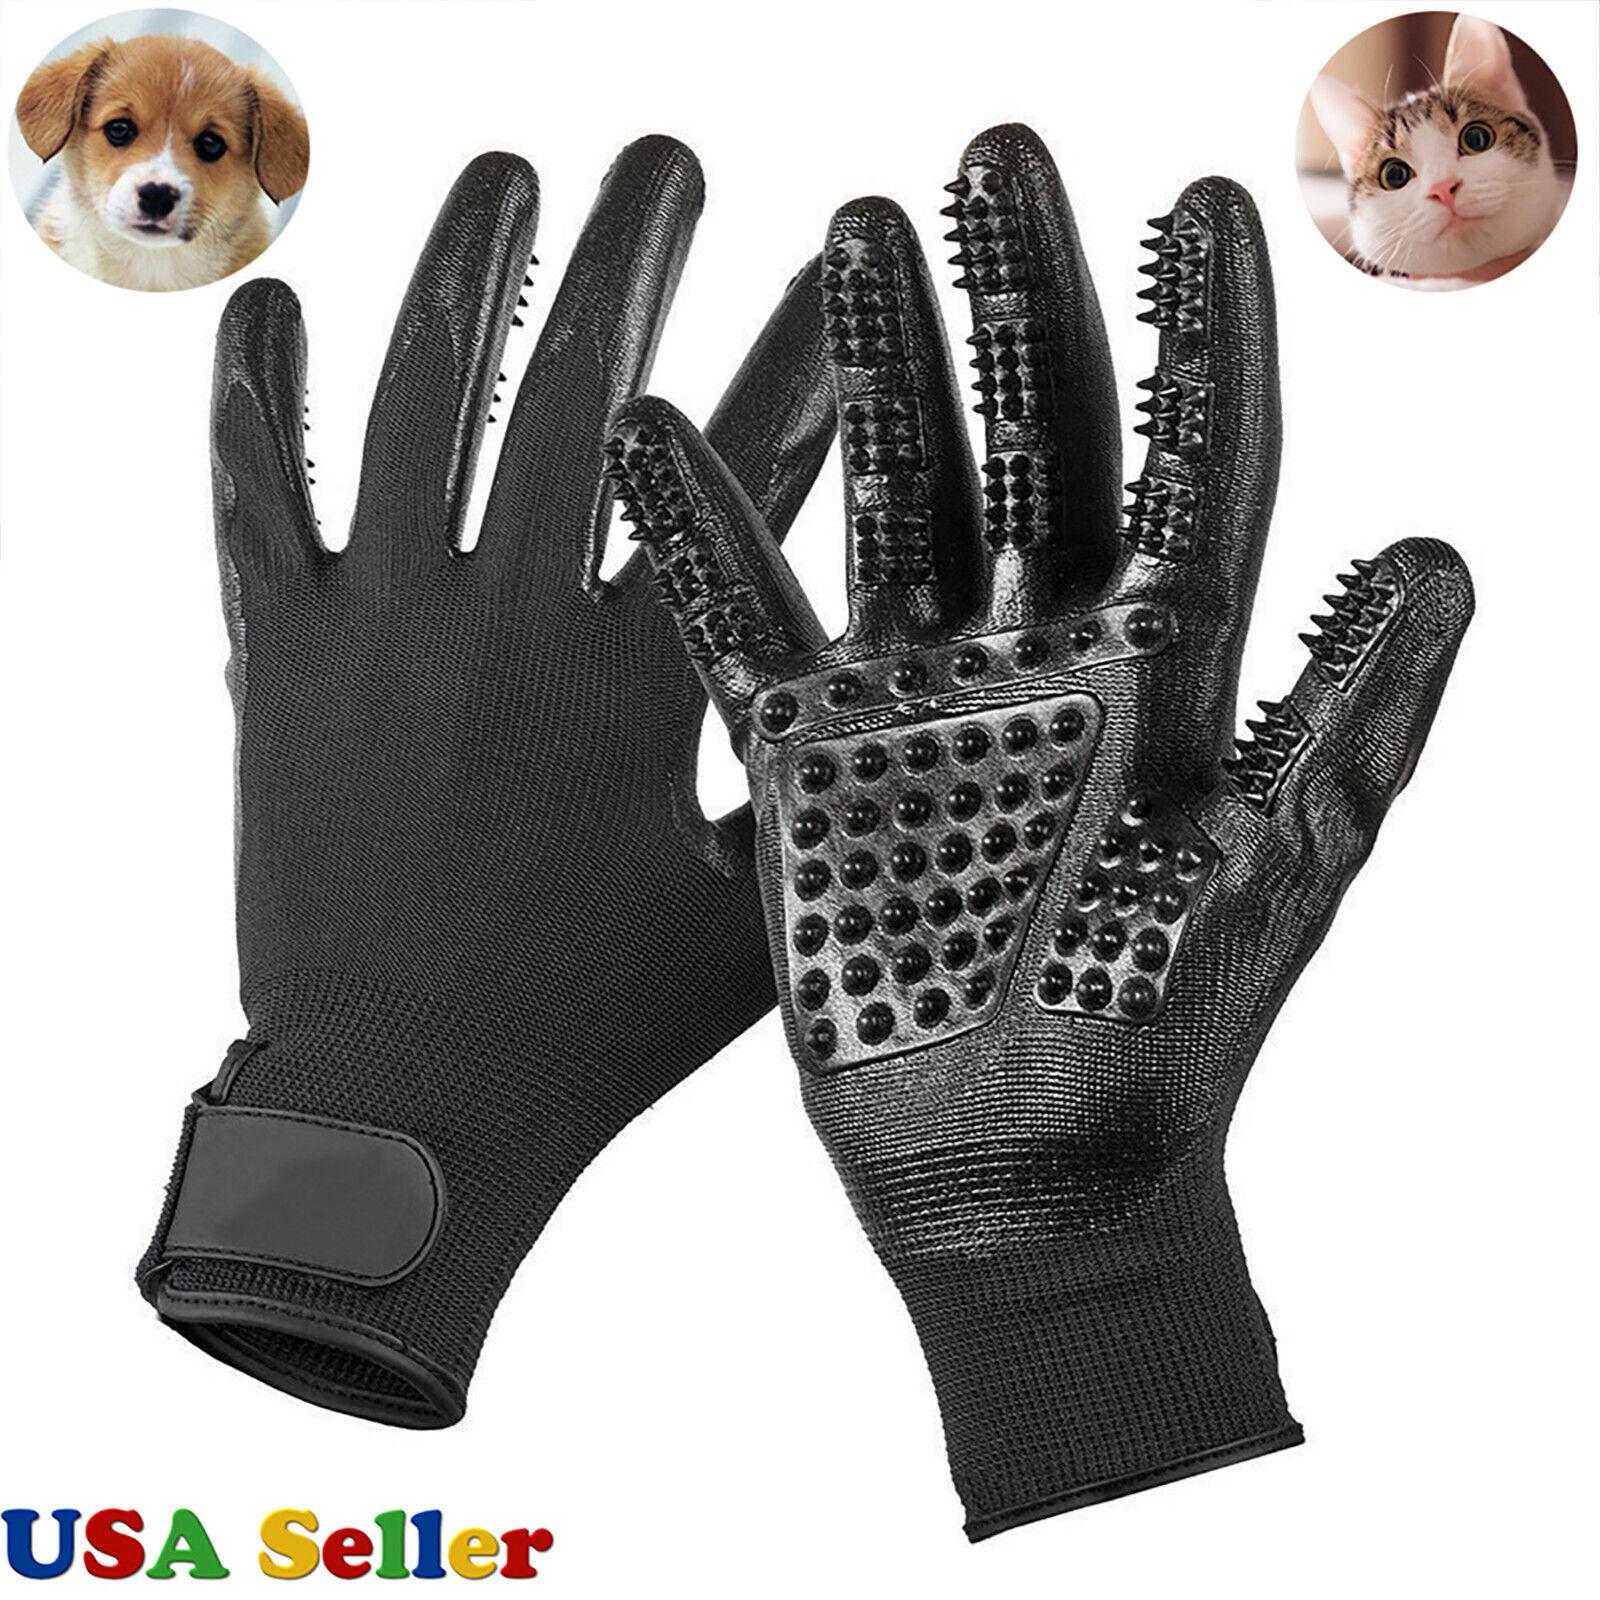 Pet Dog Cat Ninja Grooming Gloves Hair Fur Remover Bathing Shedding Massage Pair Brushes, Combs & Rakes